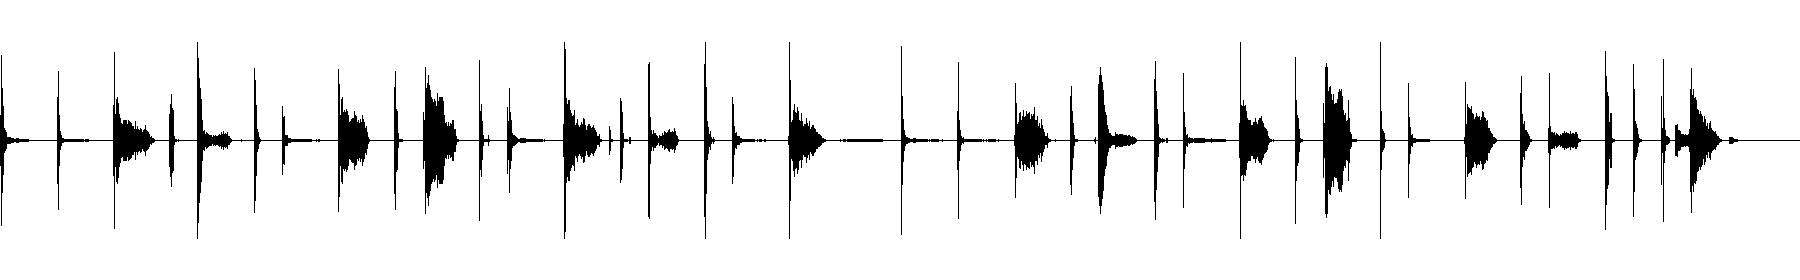 269769 dre beatbox 03 1 wav